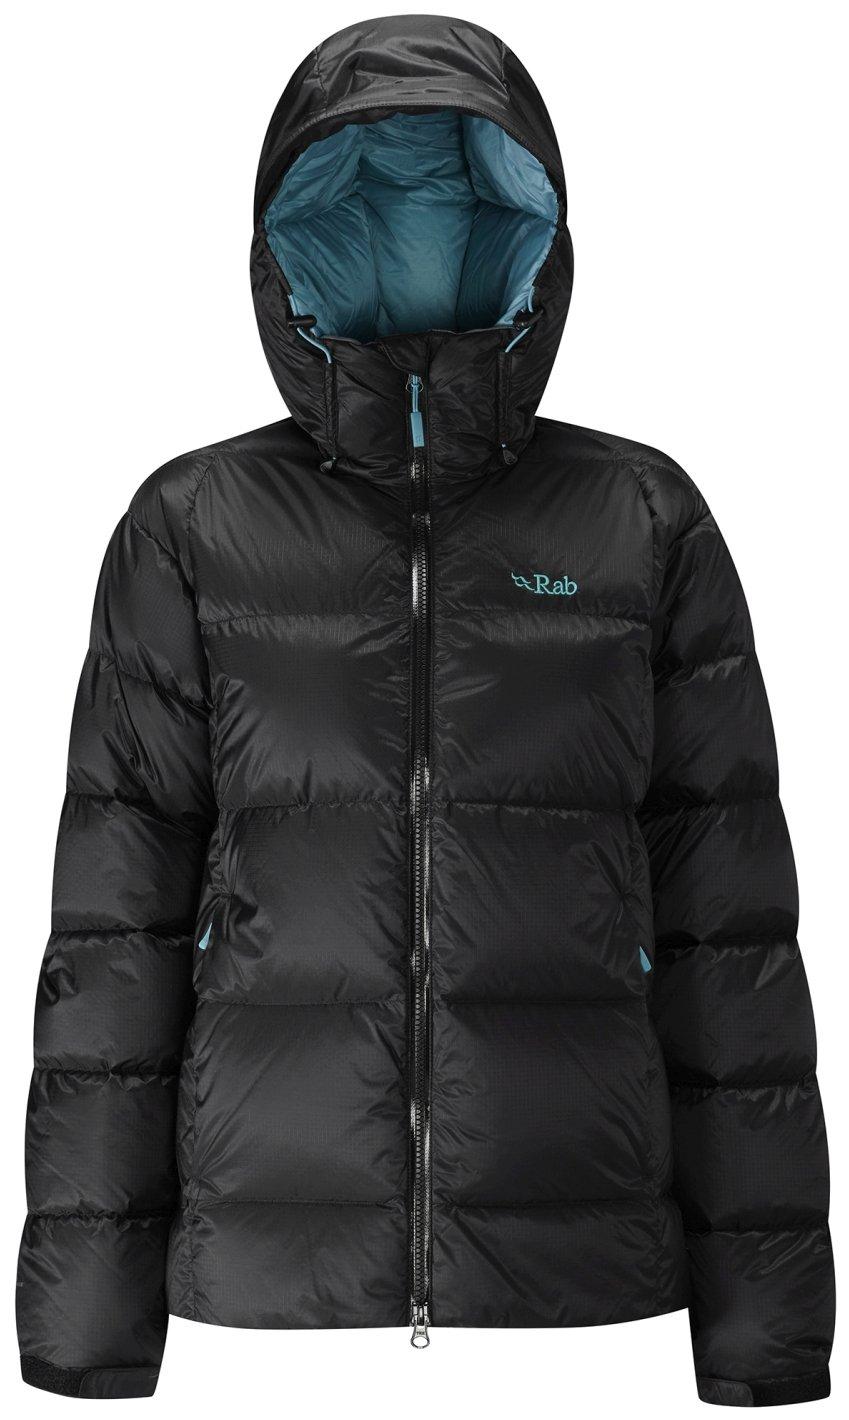 Rab Neutrino Endurance Jacket - Women's Black/Seaglass 12